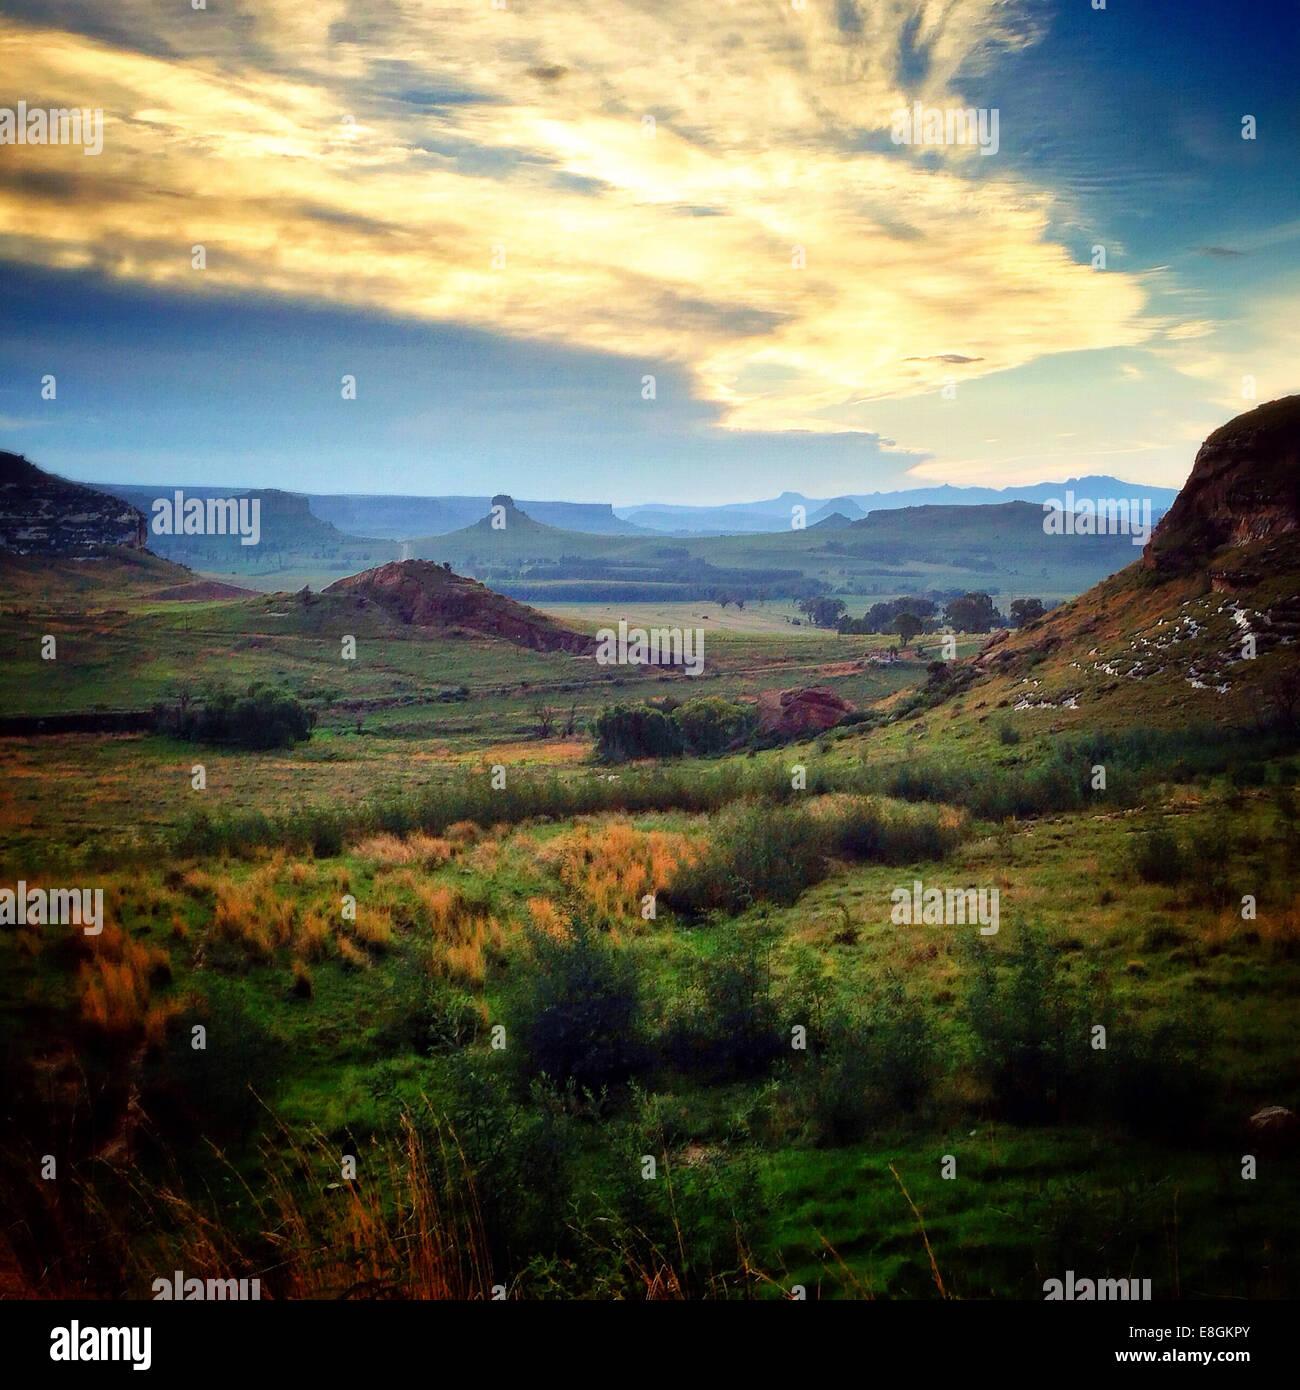 Bloemfontein, Clarens, Bayswater, South Africa Endless Valleys In Clarens - Stock Image